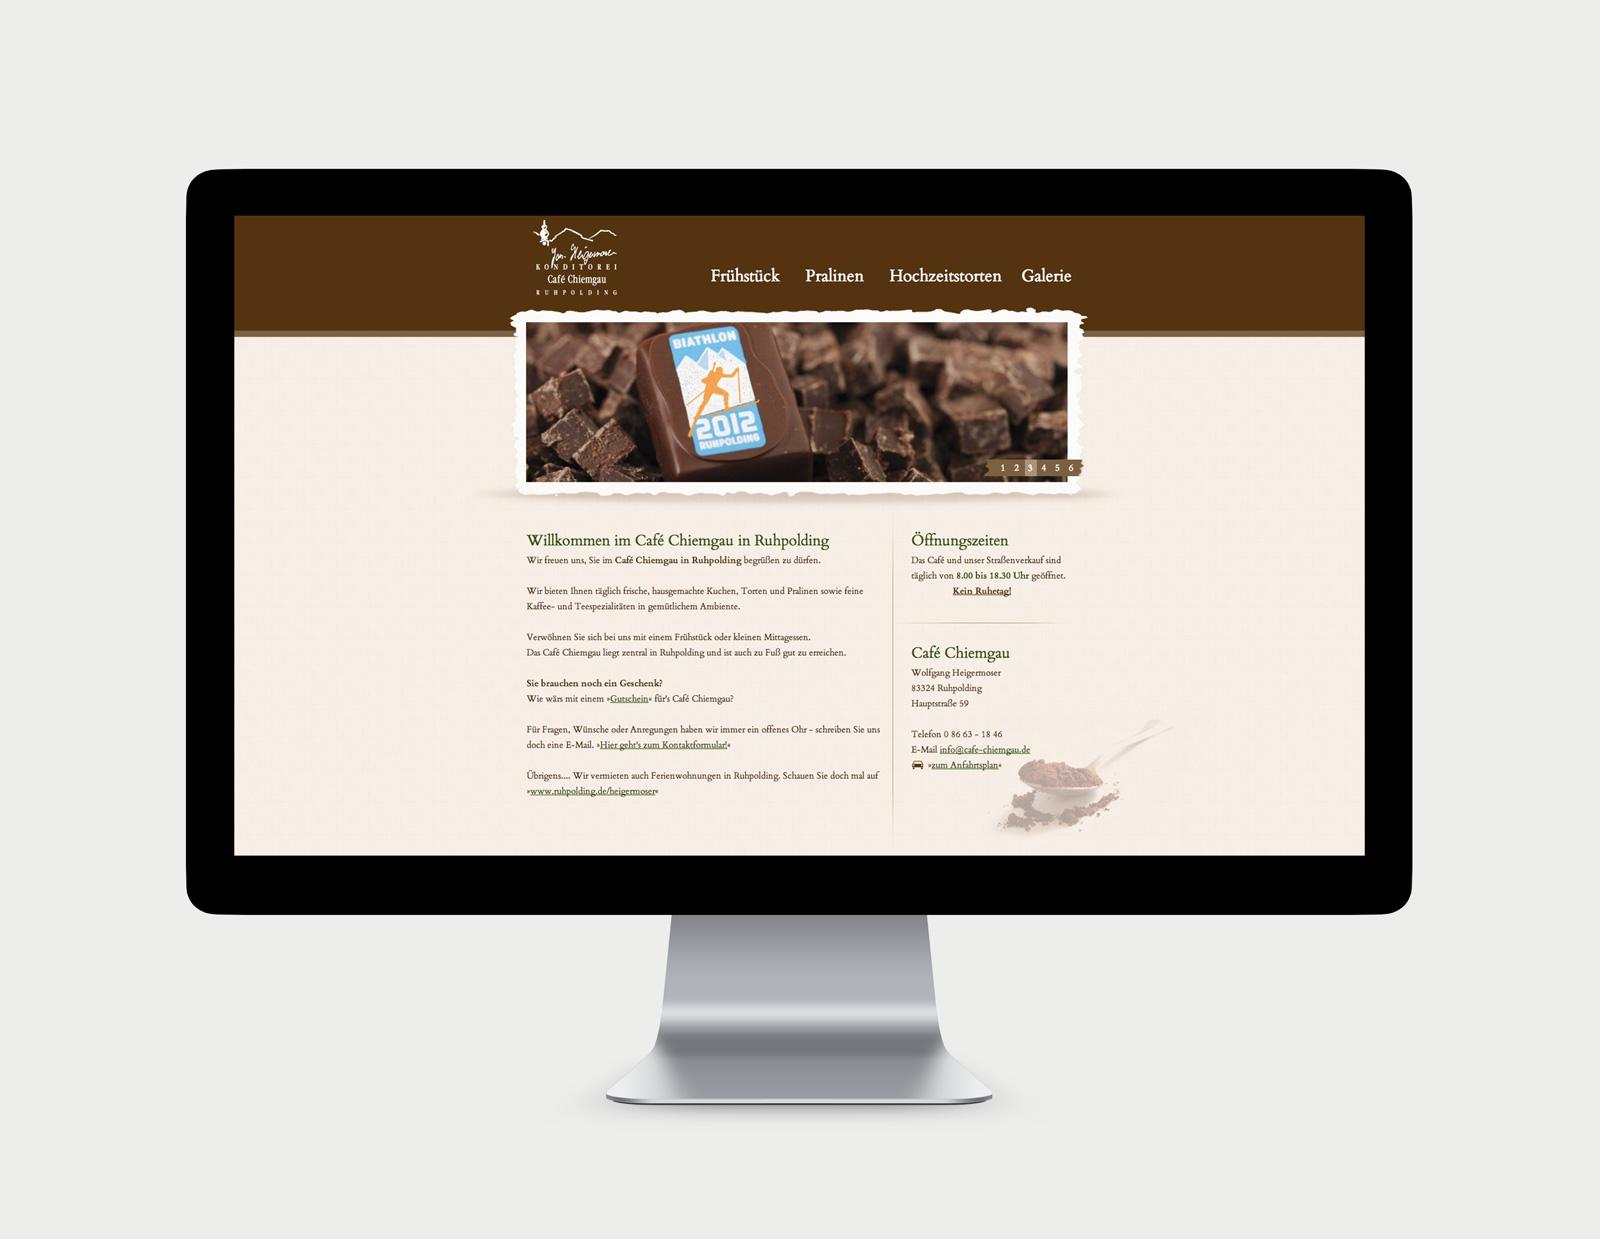 Café Chiemgau Ruhpolding Website Übersicht